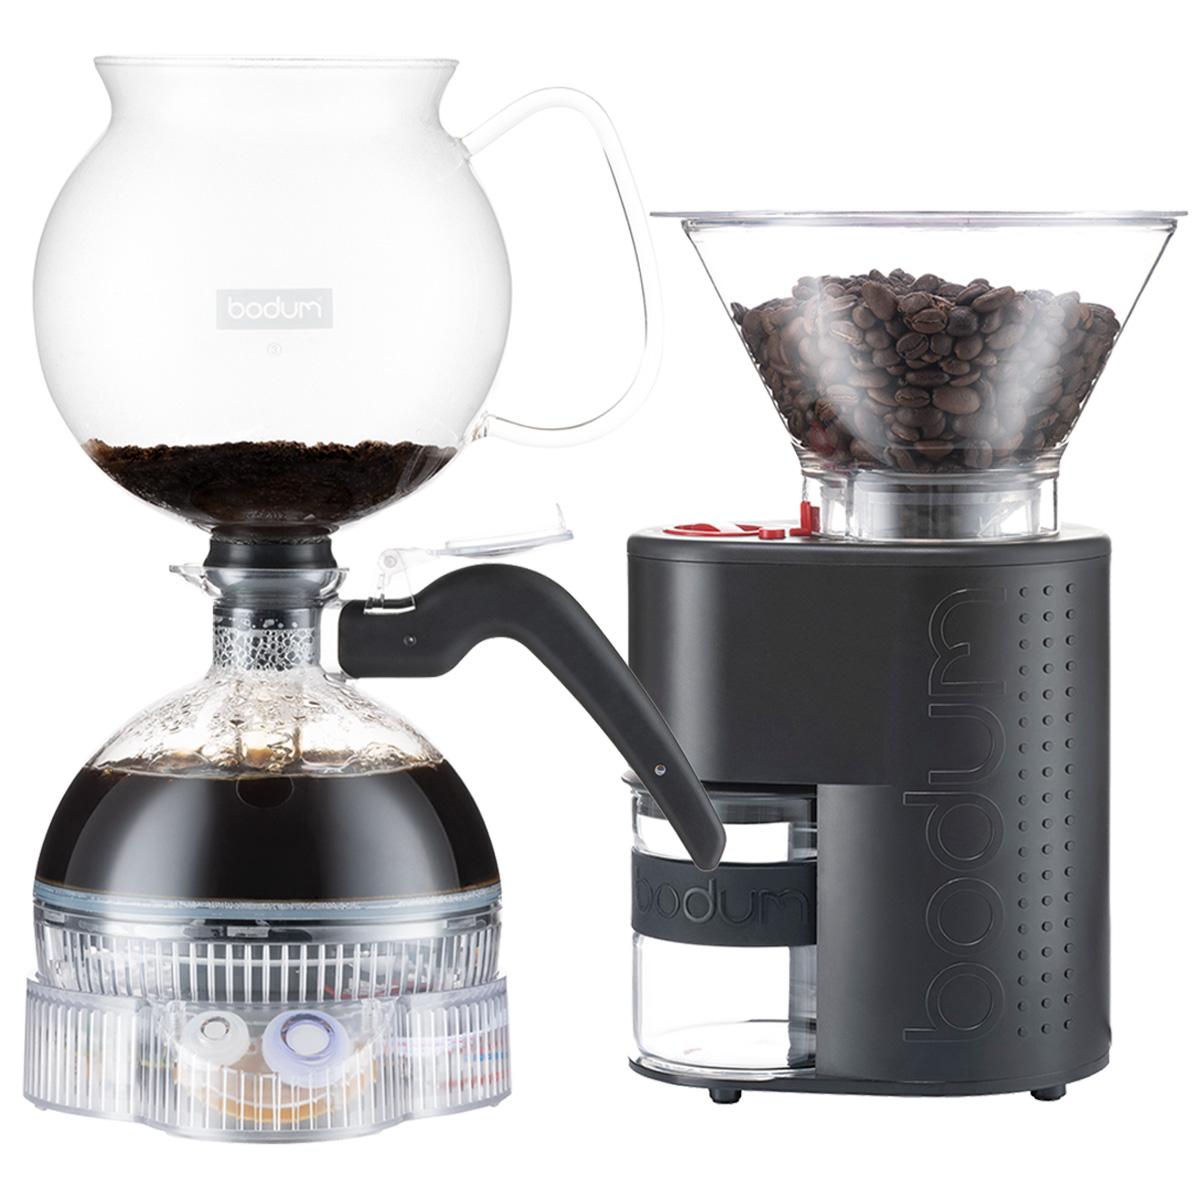 Image of   Bodum ePebo vakuumkaffebrygger & Bistro kaffekværn